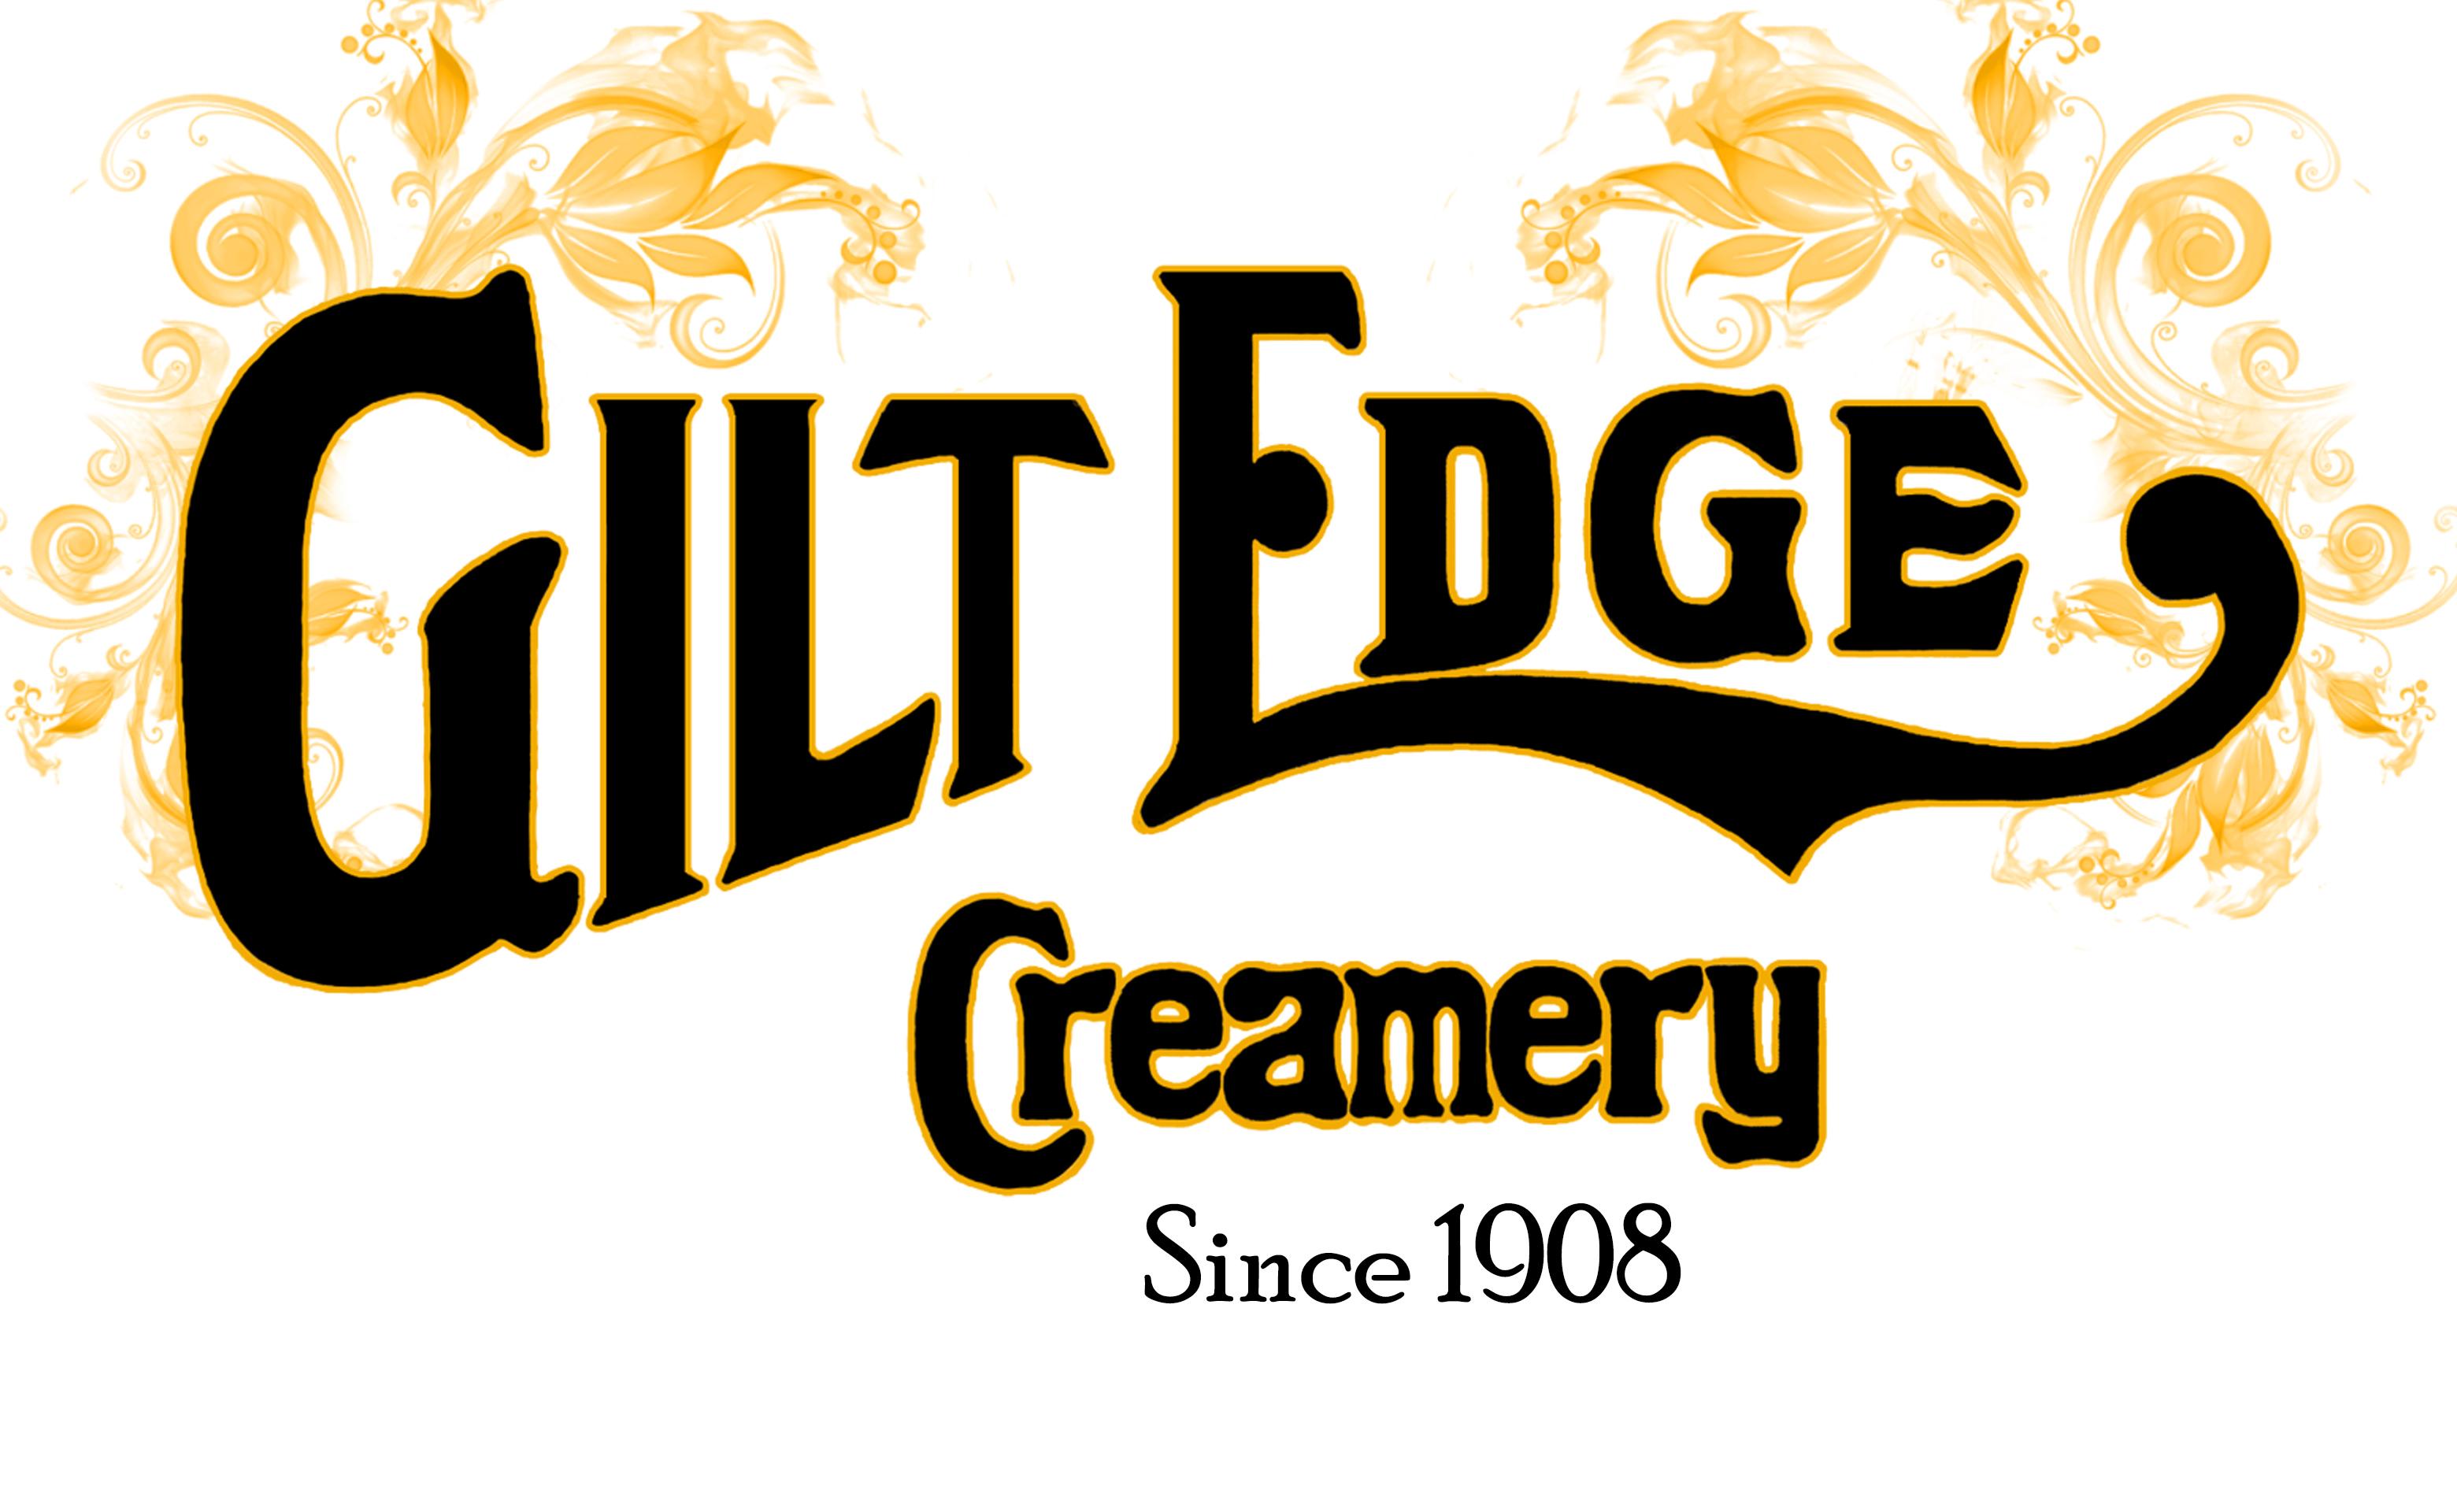 Gilt Edge Creamery